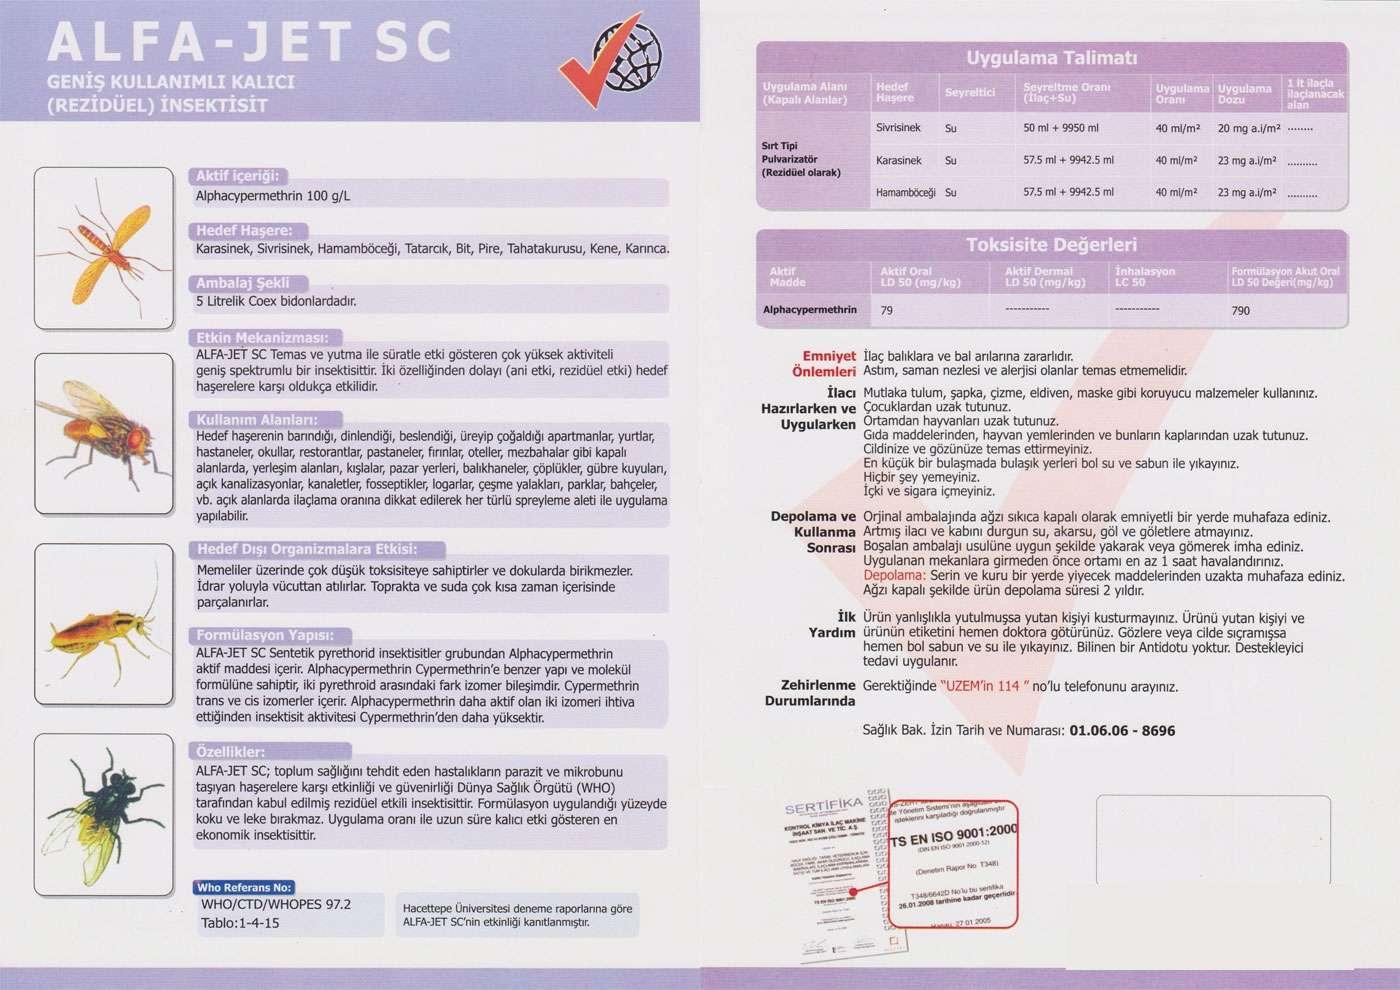 Alfa-Jet SC